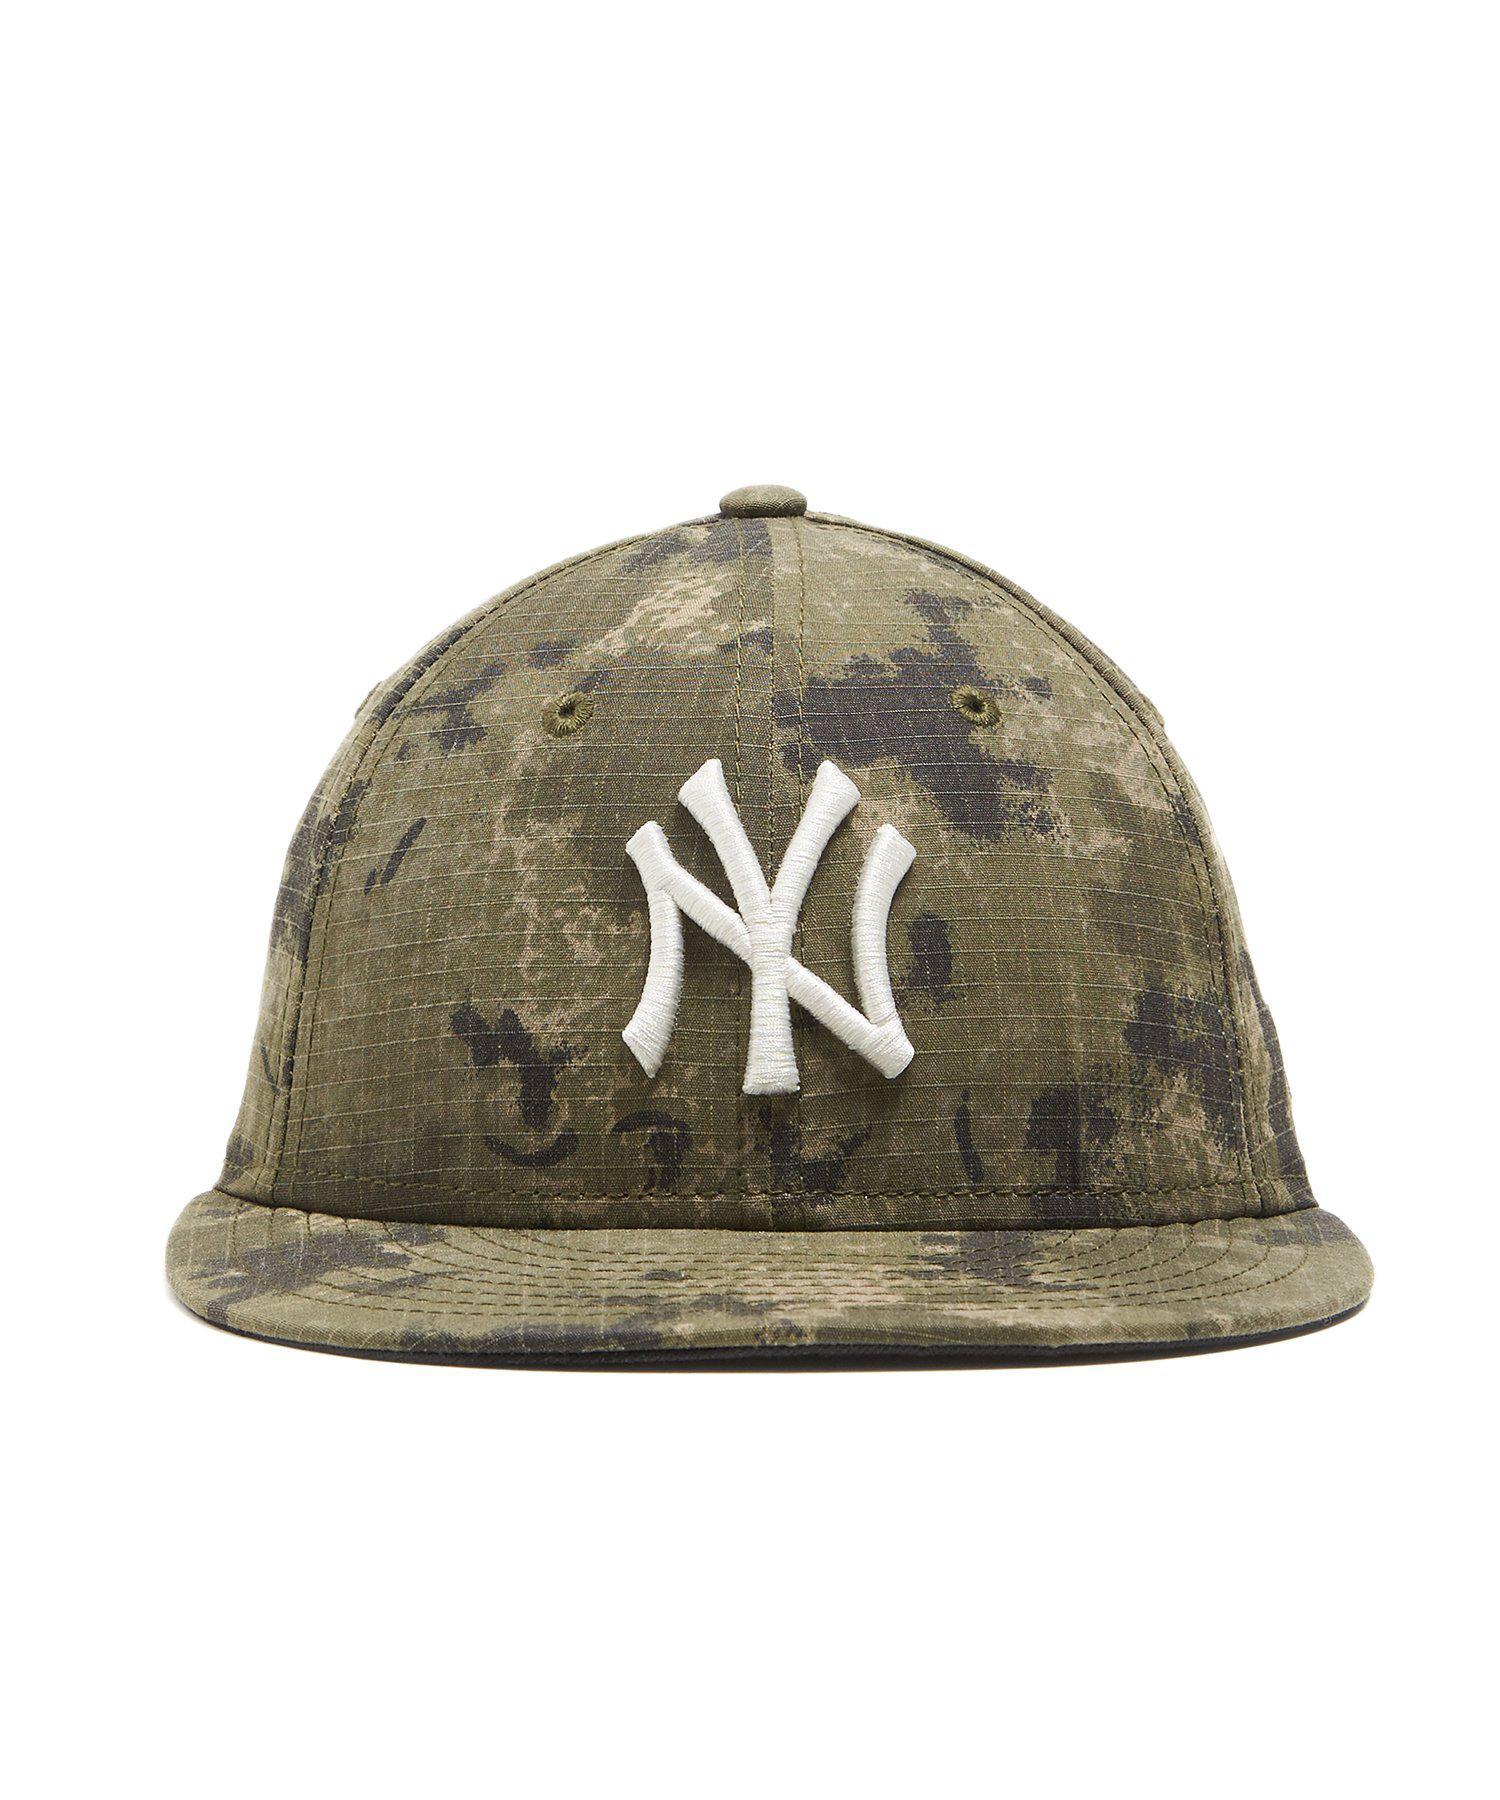 NEW ERA HATS New York Yankees Cap In Camo Ripstop in Green for Men ... ad14ba571fa4